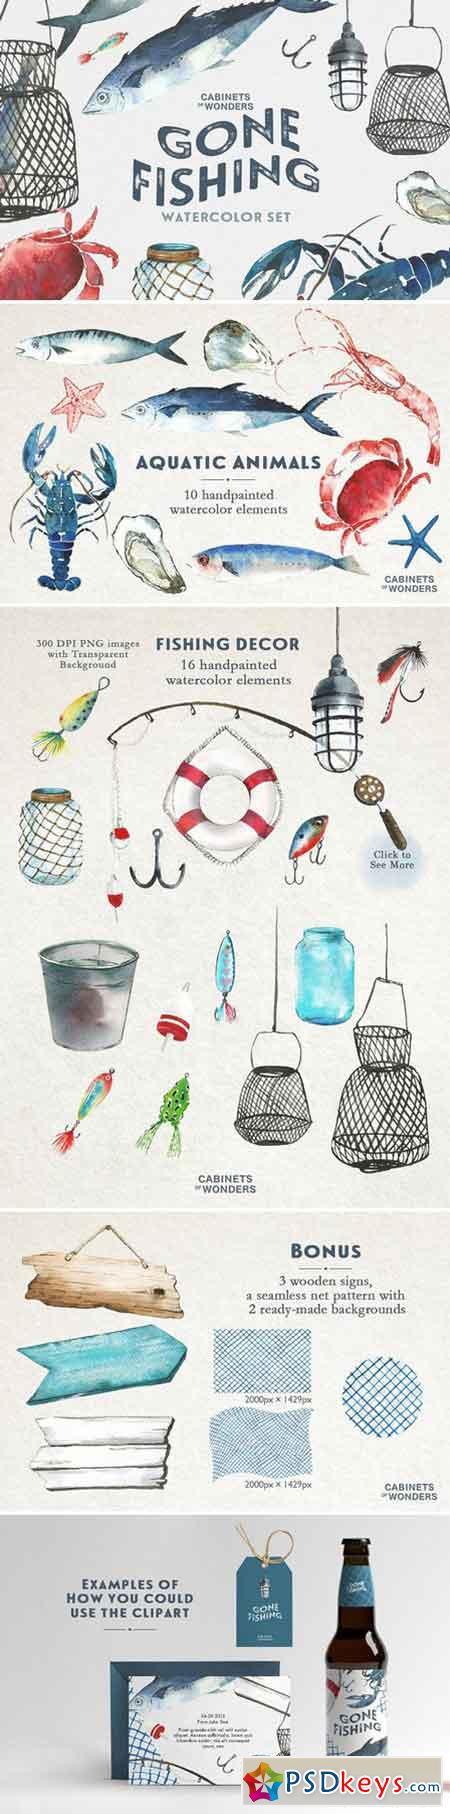 Gone Fishing Watercolor Clip arts 2223864